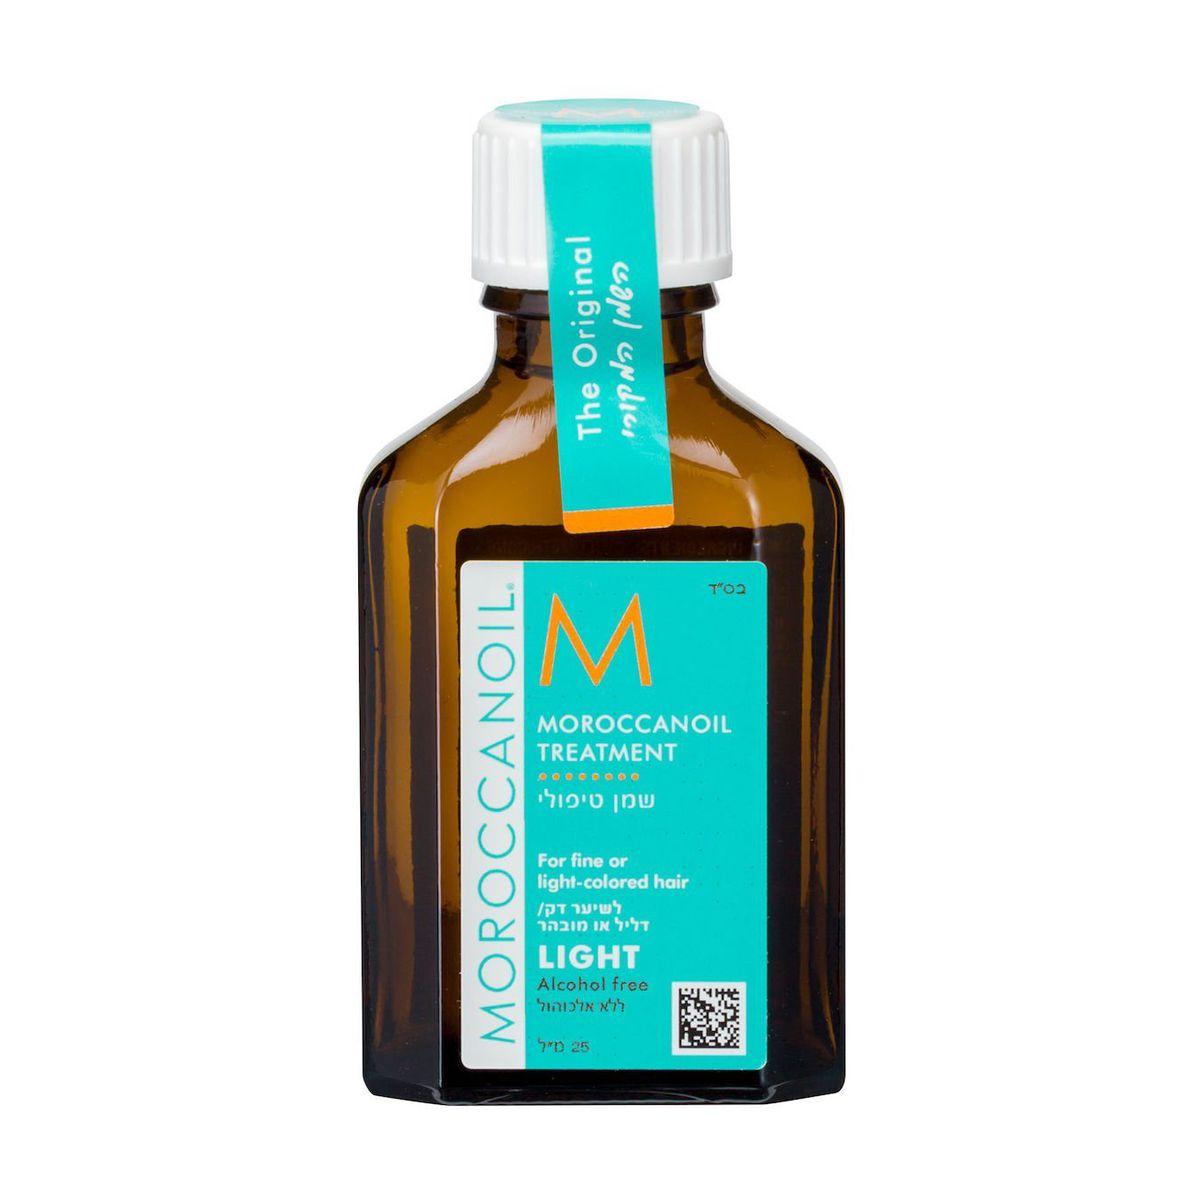 Moroccanoil Hair Oil Treatment